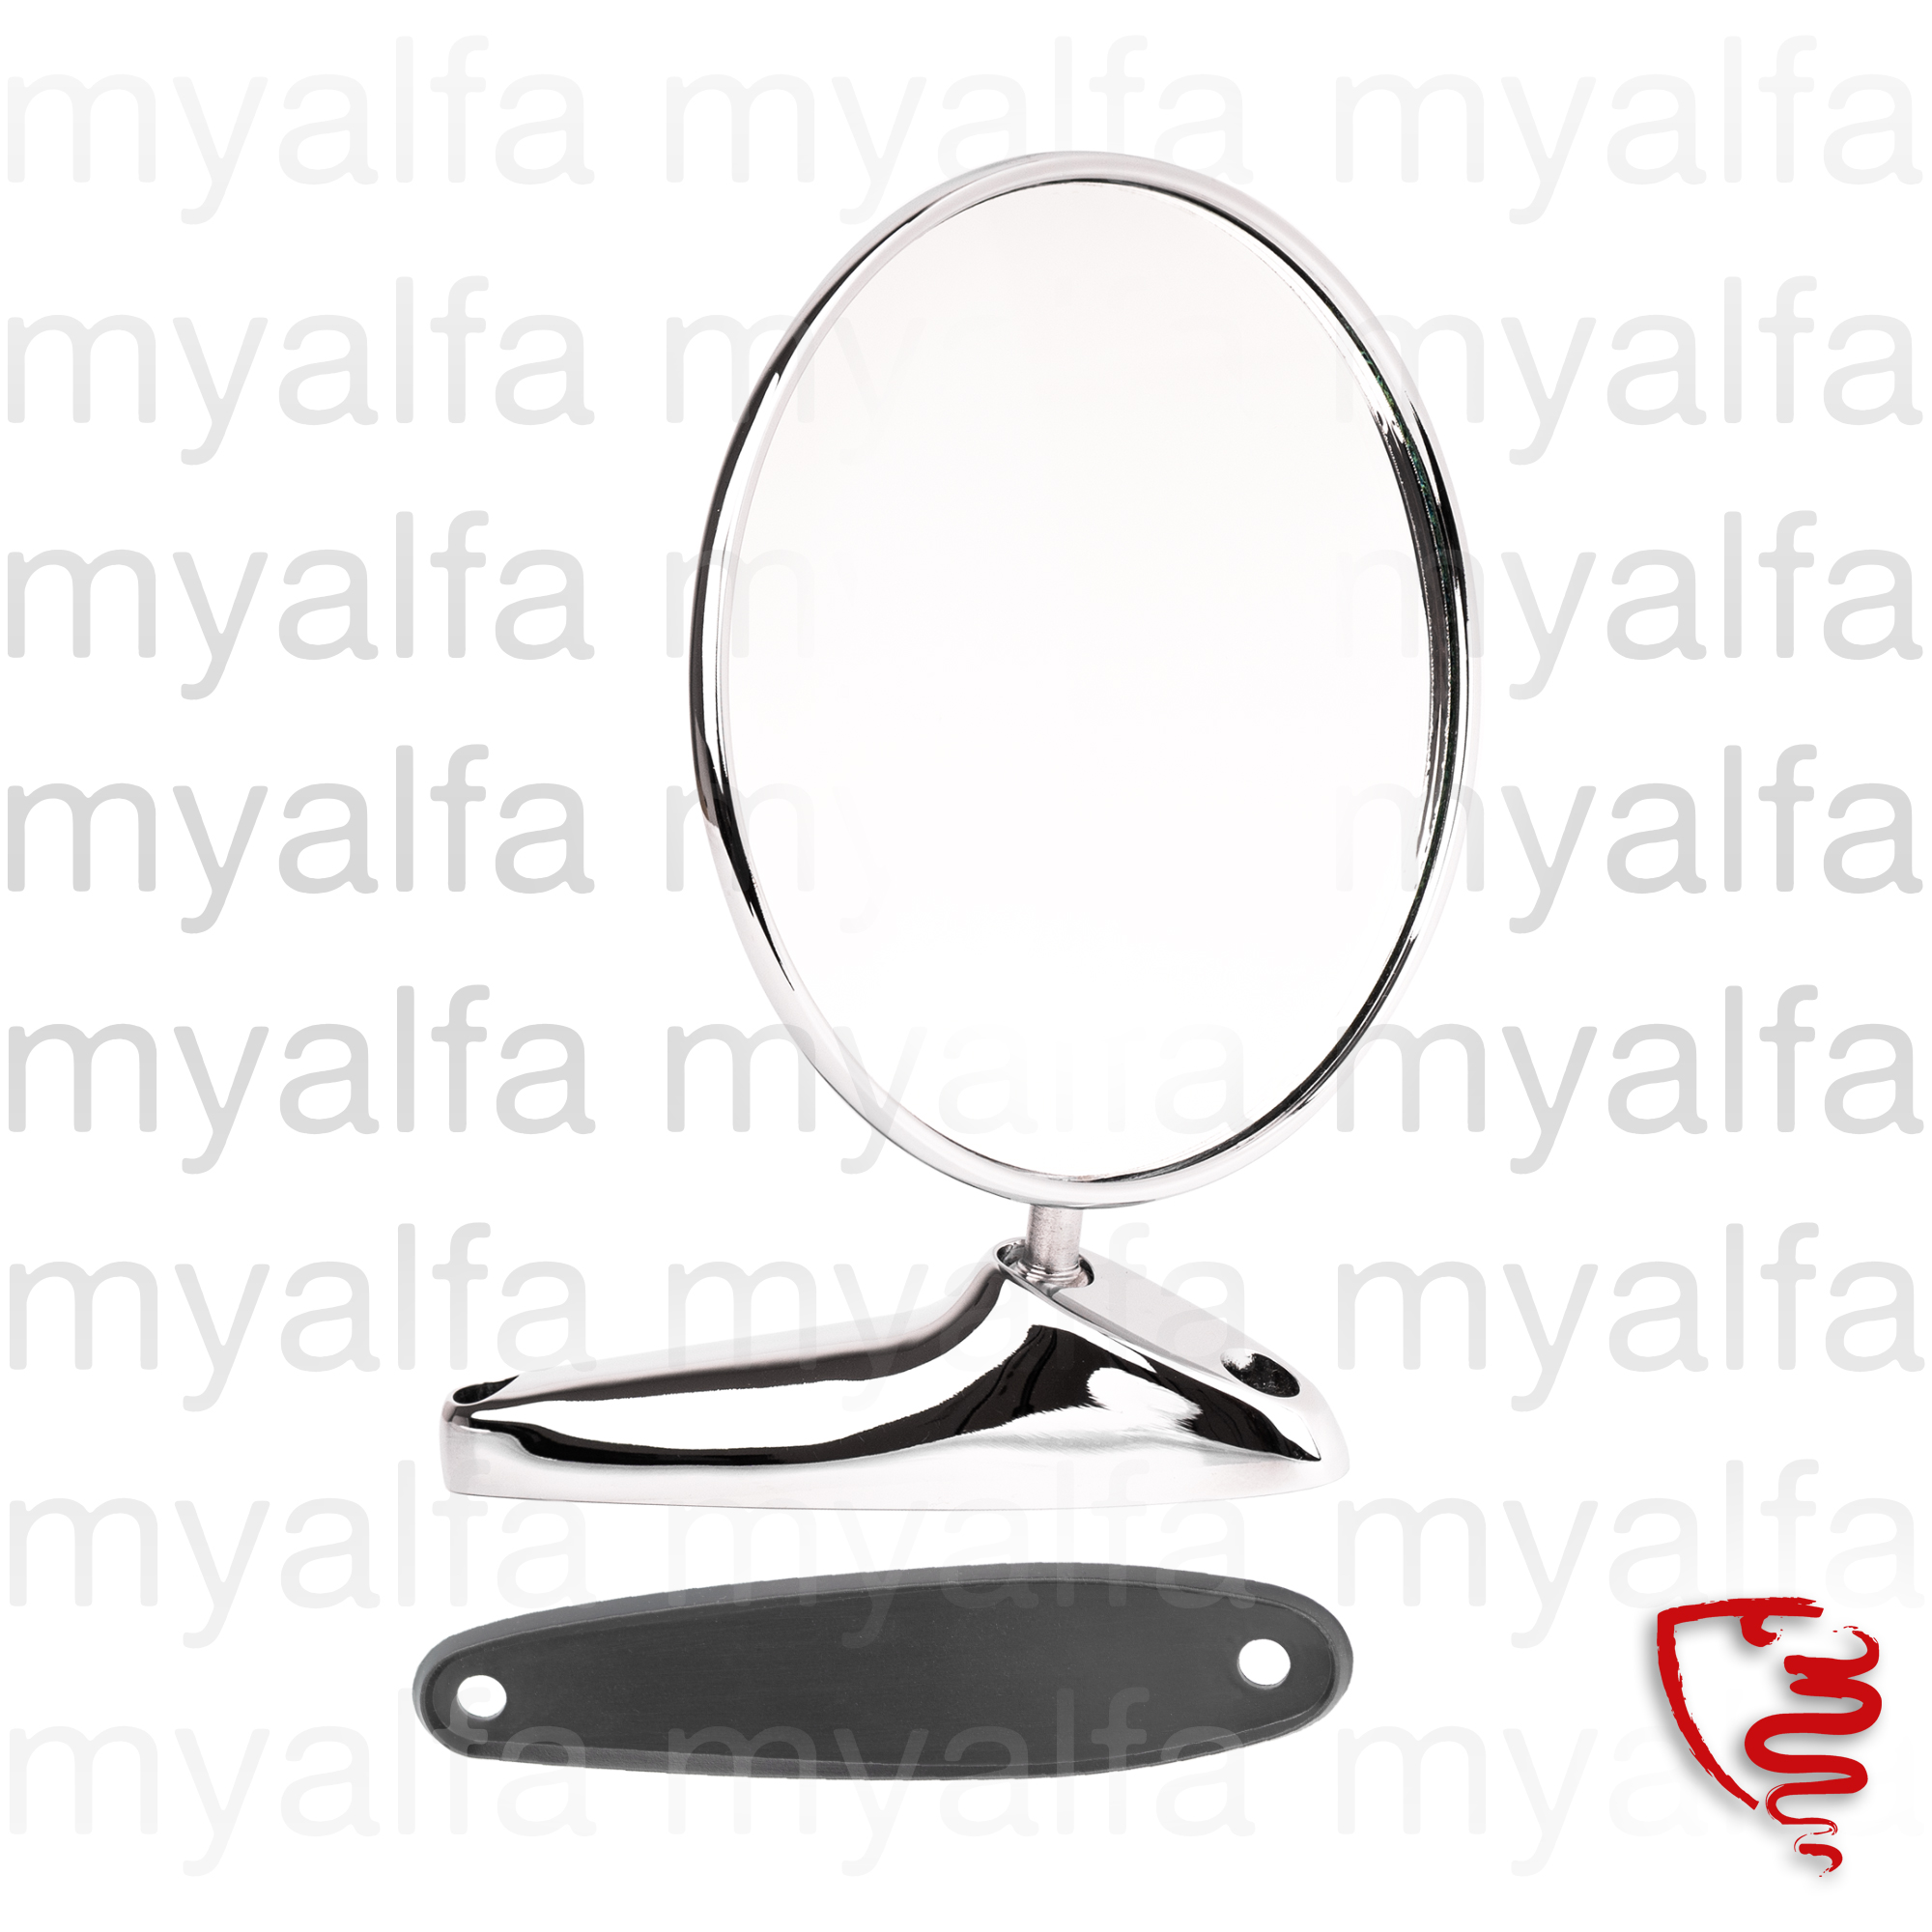 Round mirror with Alfa Romeo badge for 105/115, Body parts, Chrome Parts, Mirror